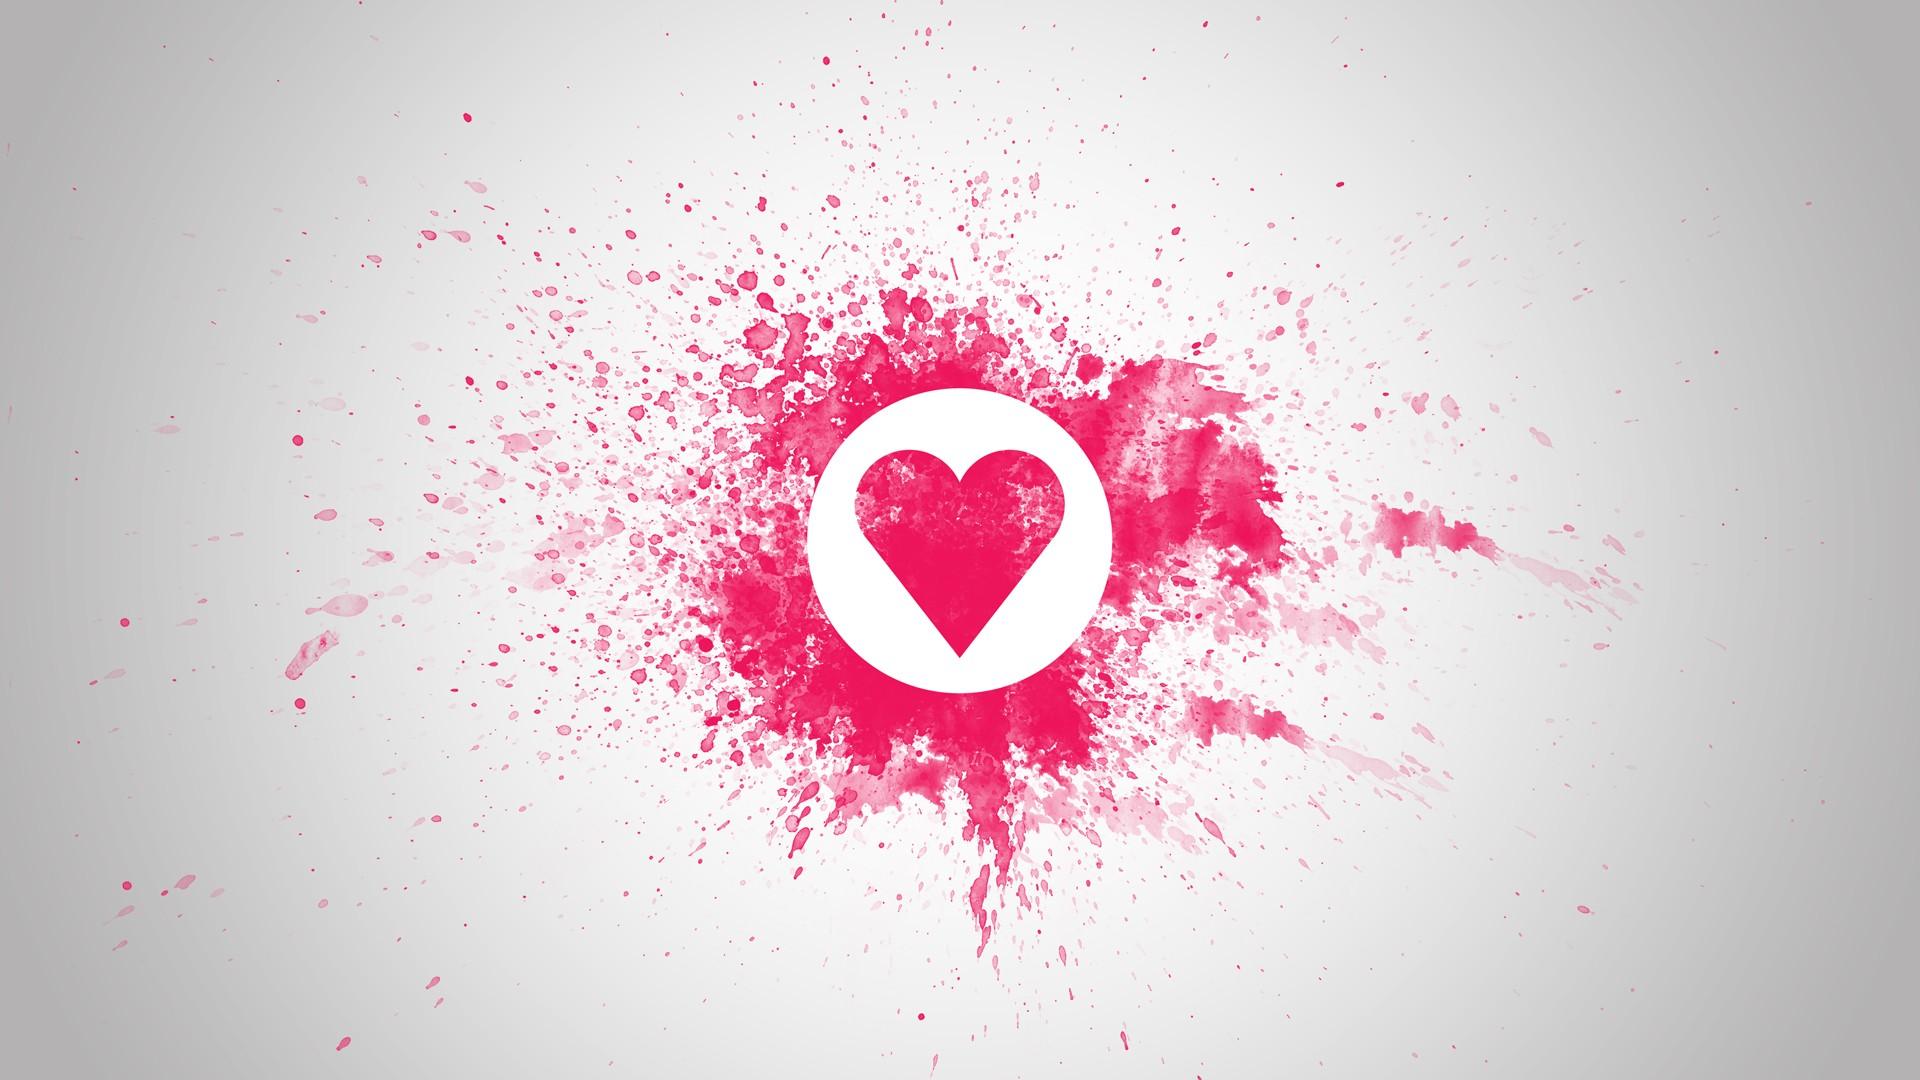 Cool-Pictures-Love-Heart-HD-Wallpaper.jpg